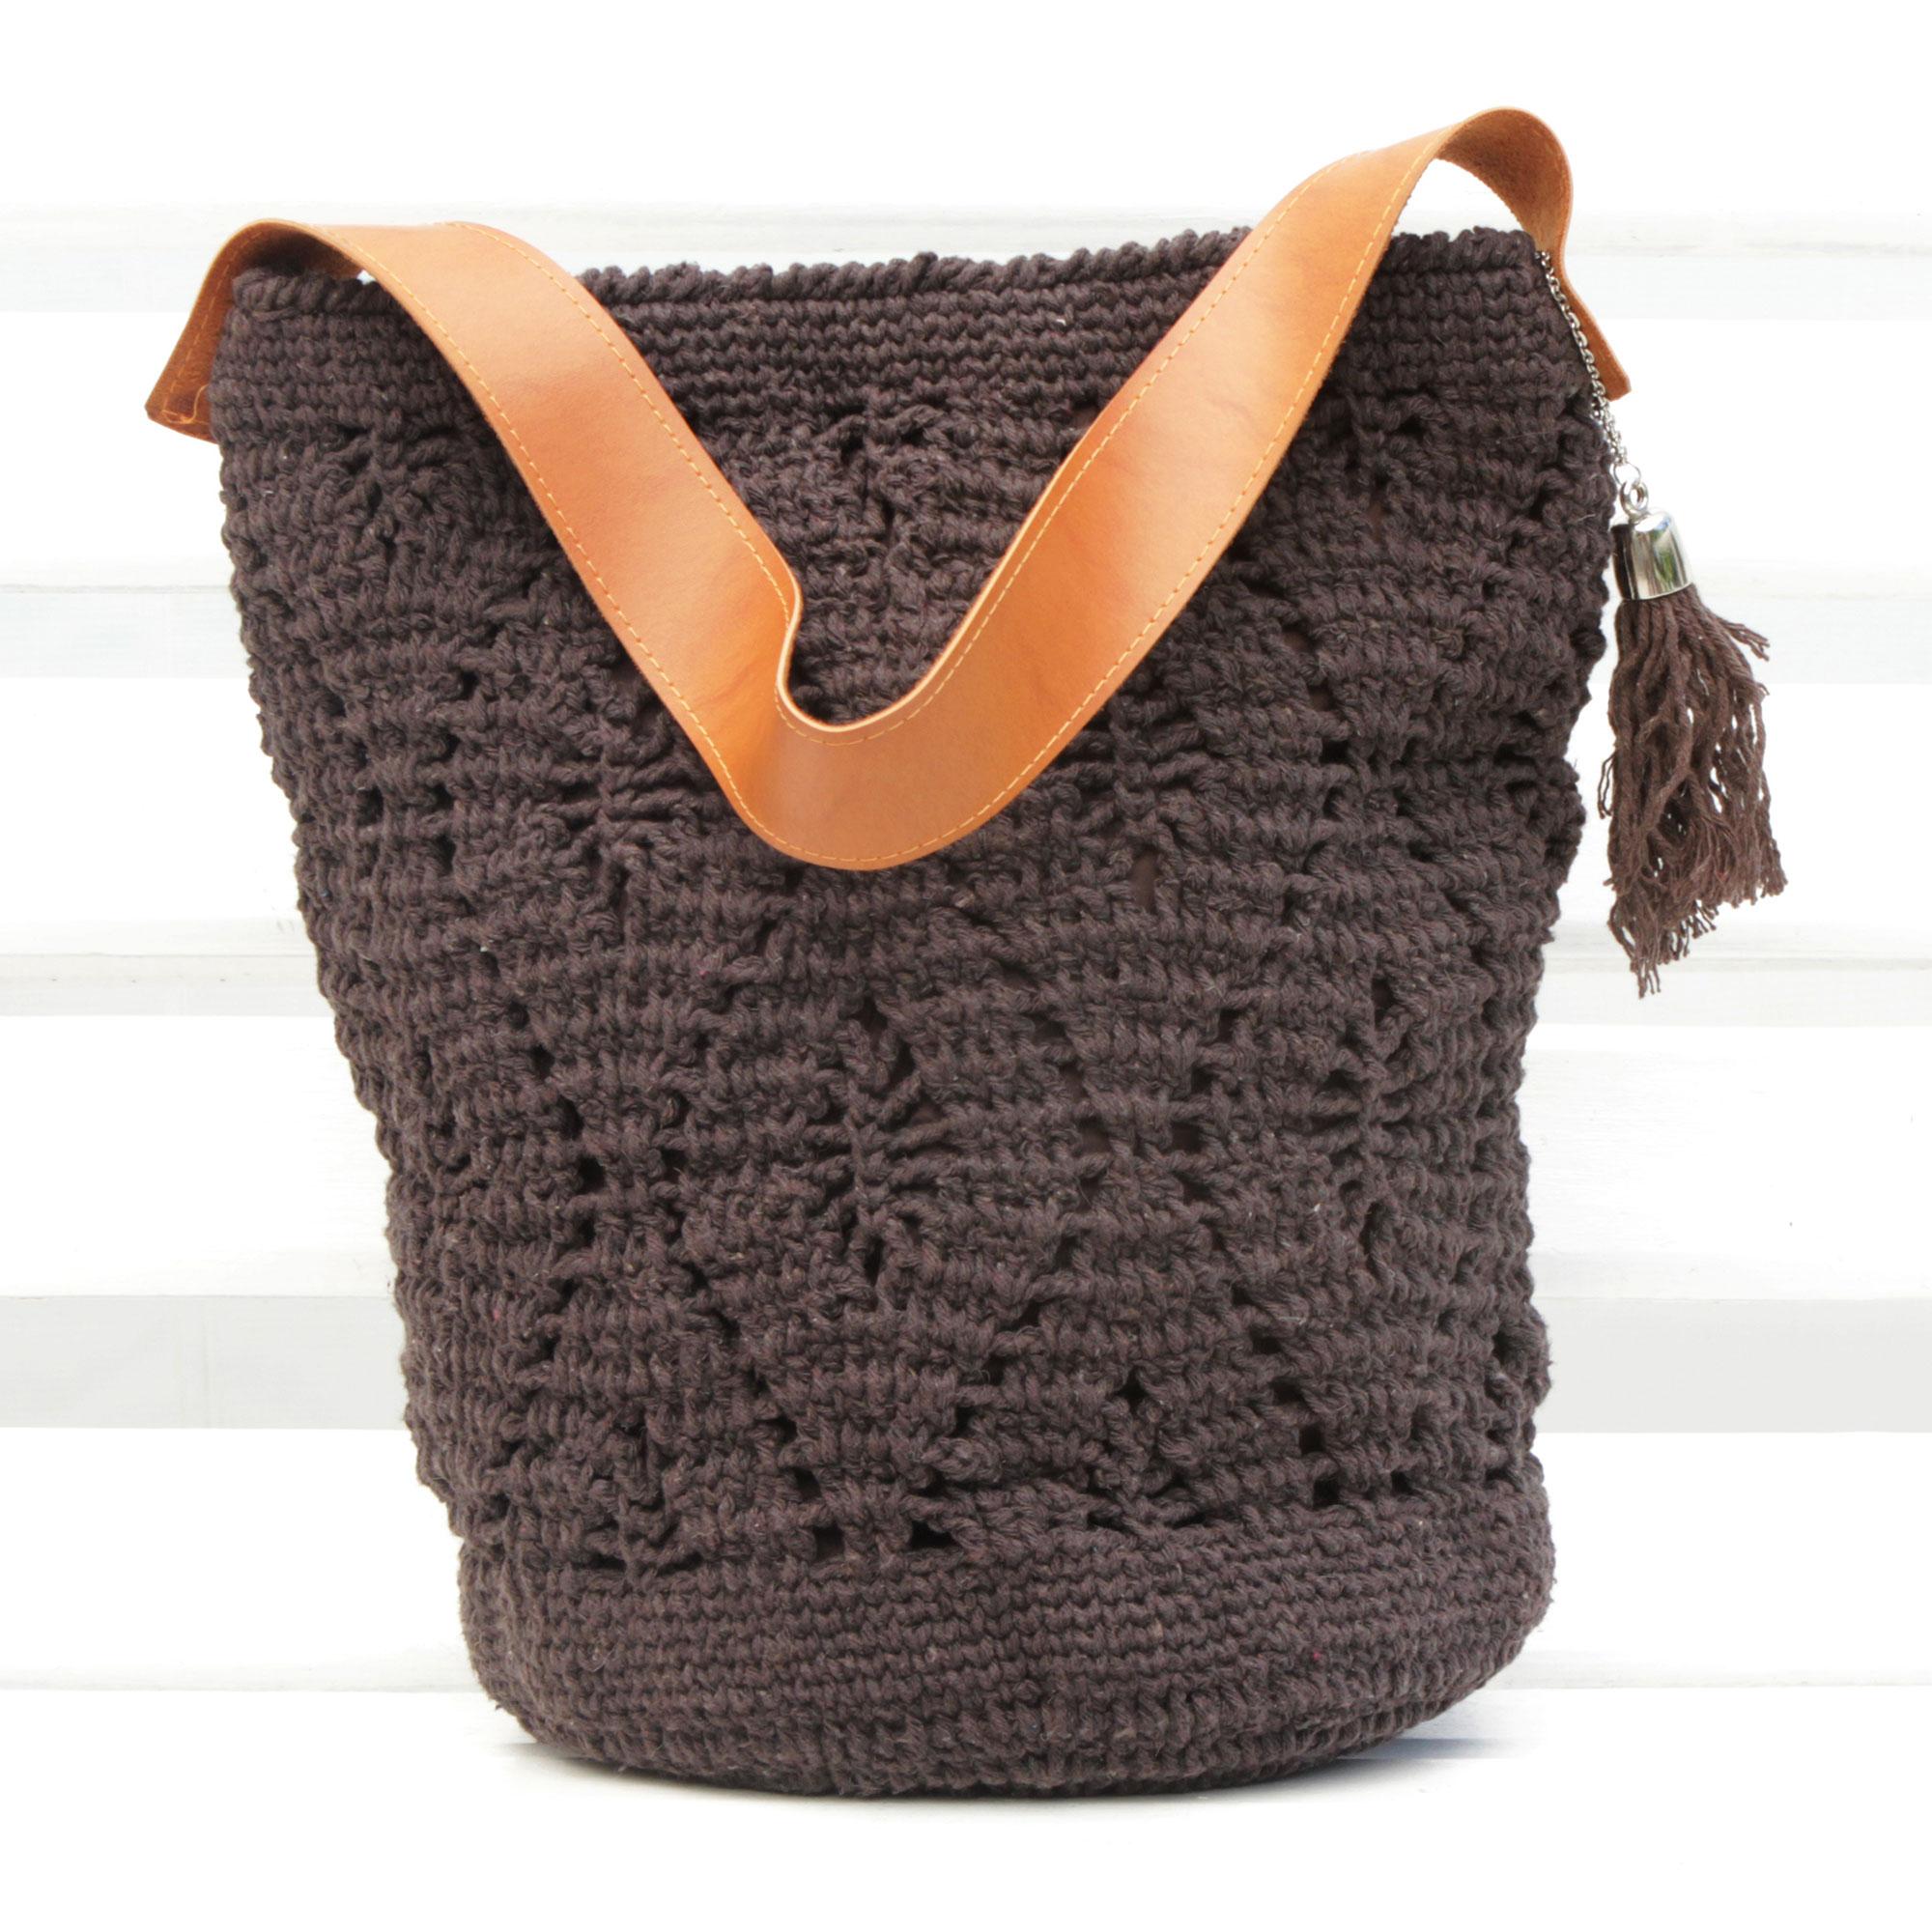 Crocheted Cotton Bucket Bag In Espresso From Brazil Diamond